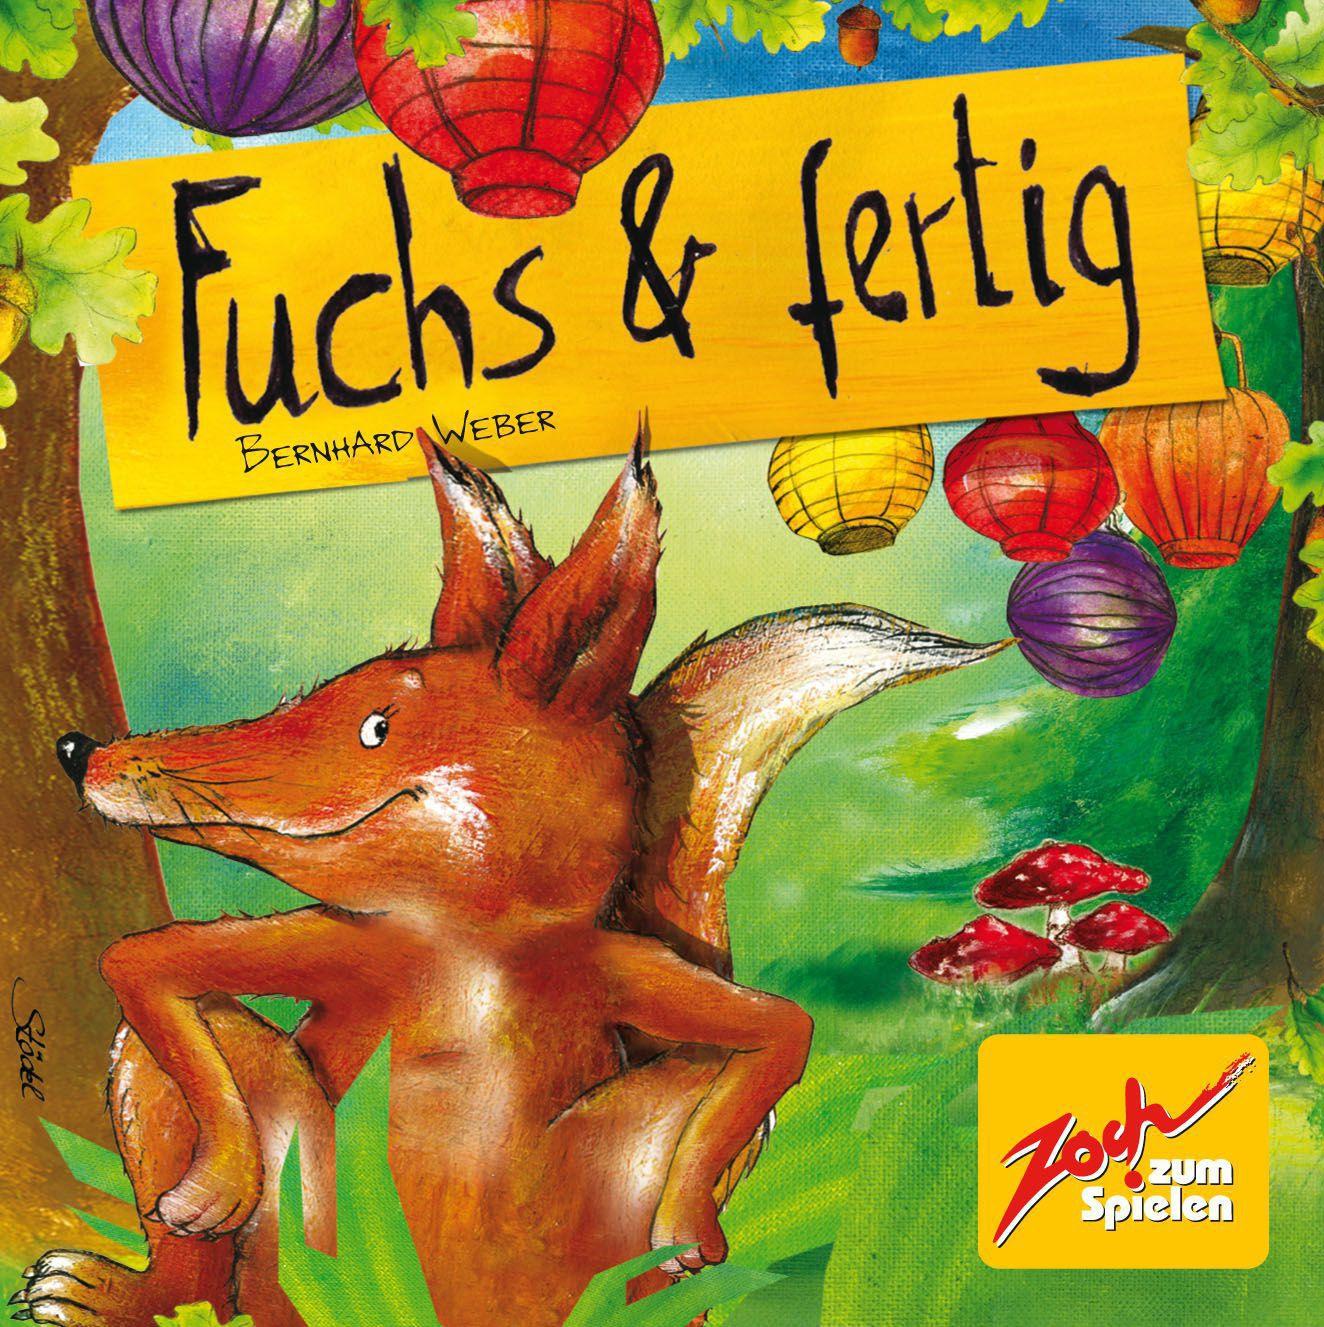 Kinderspiel Fuchs & Fertig